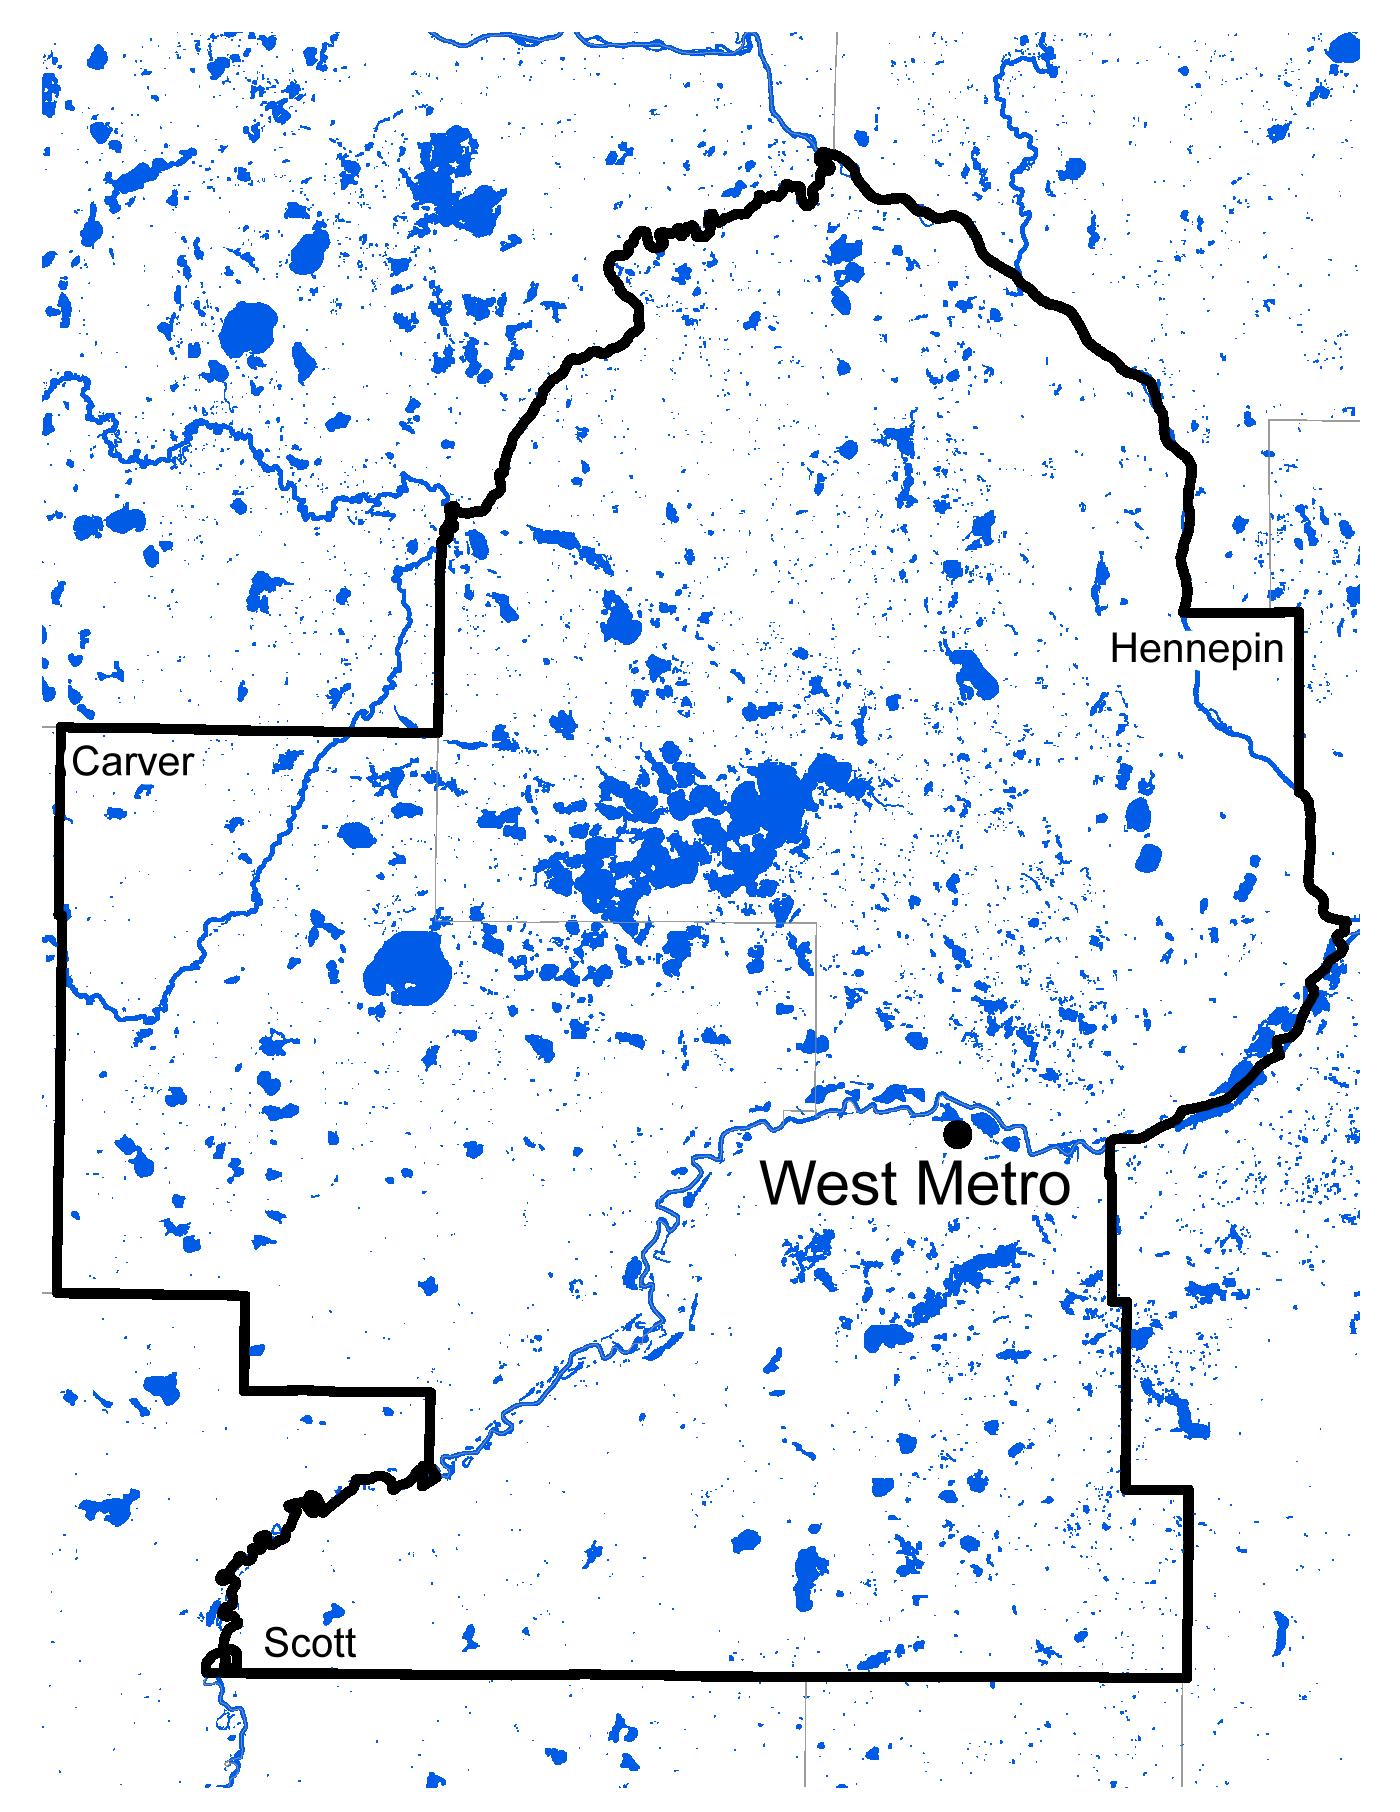 Map of West Metro work area